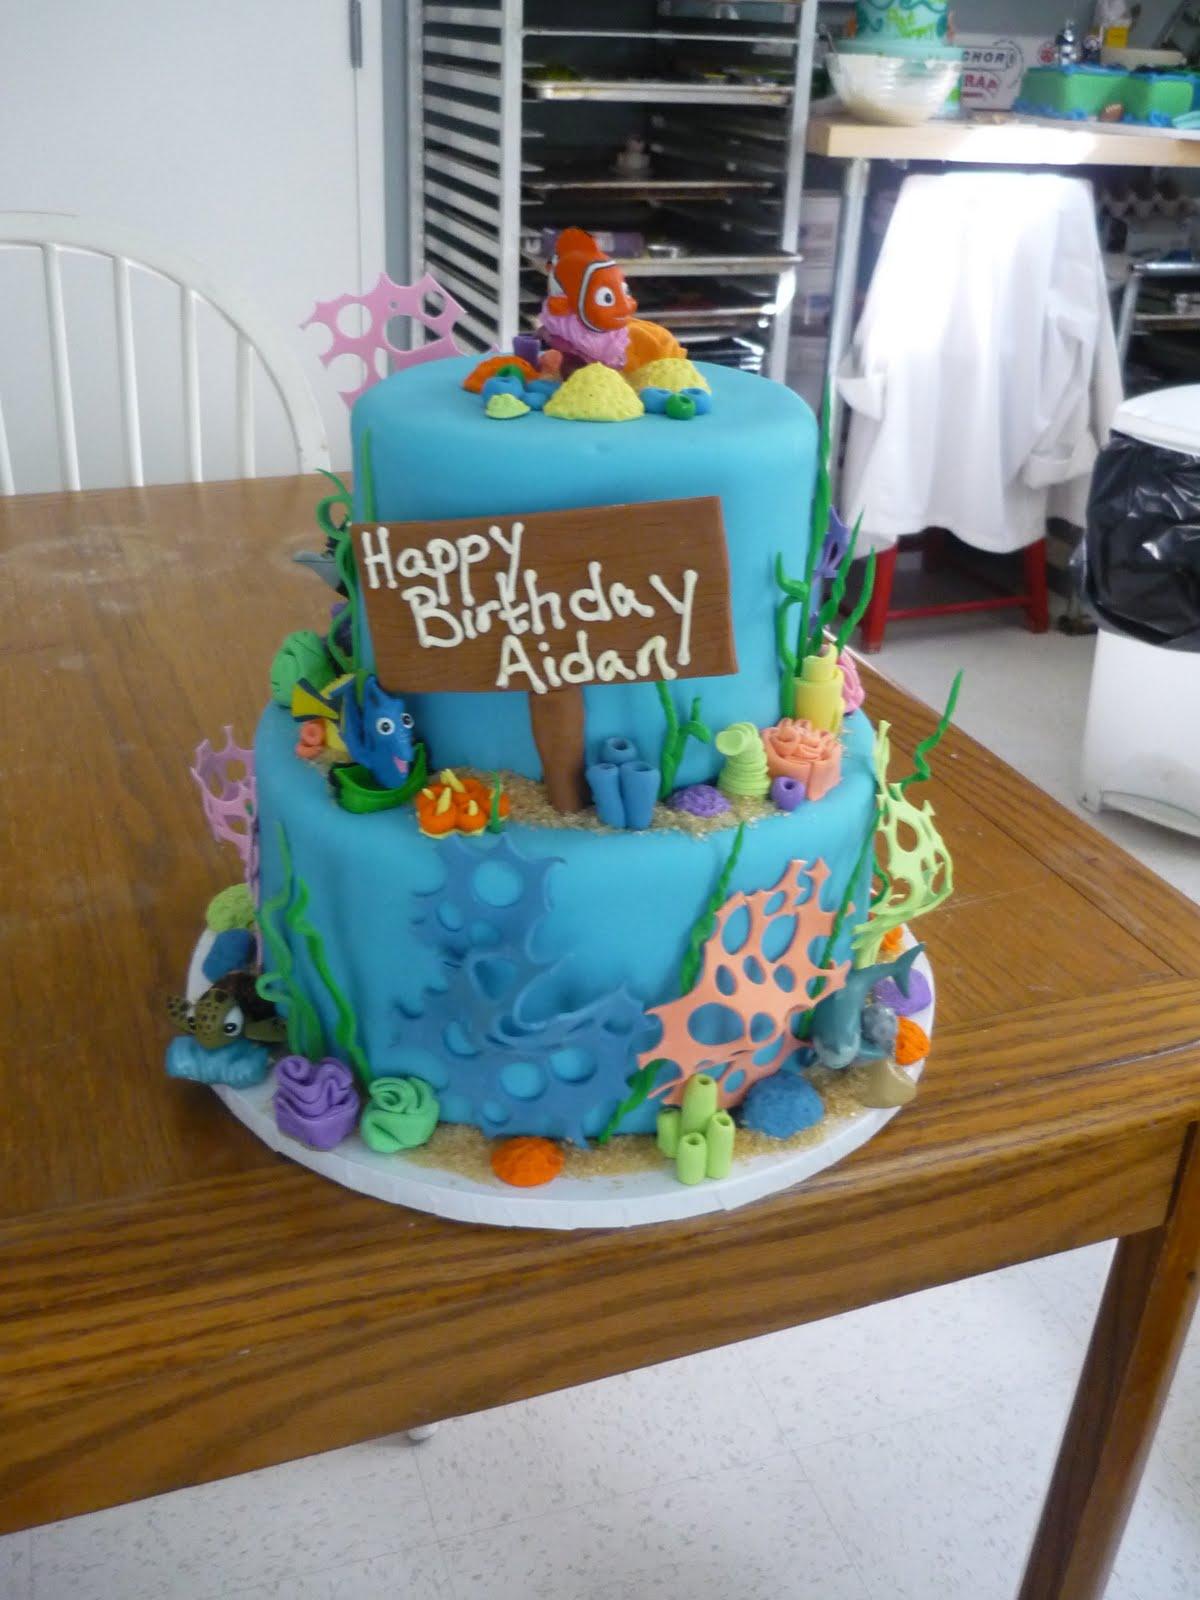 Artisan Bake Shop Finding Nemo Birthday Cake